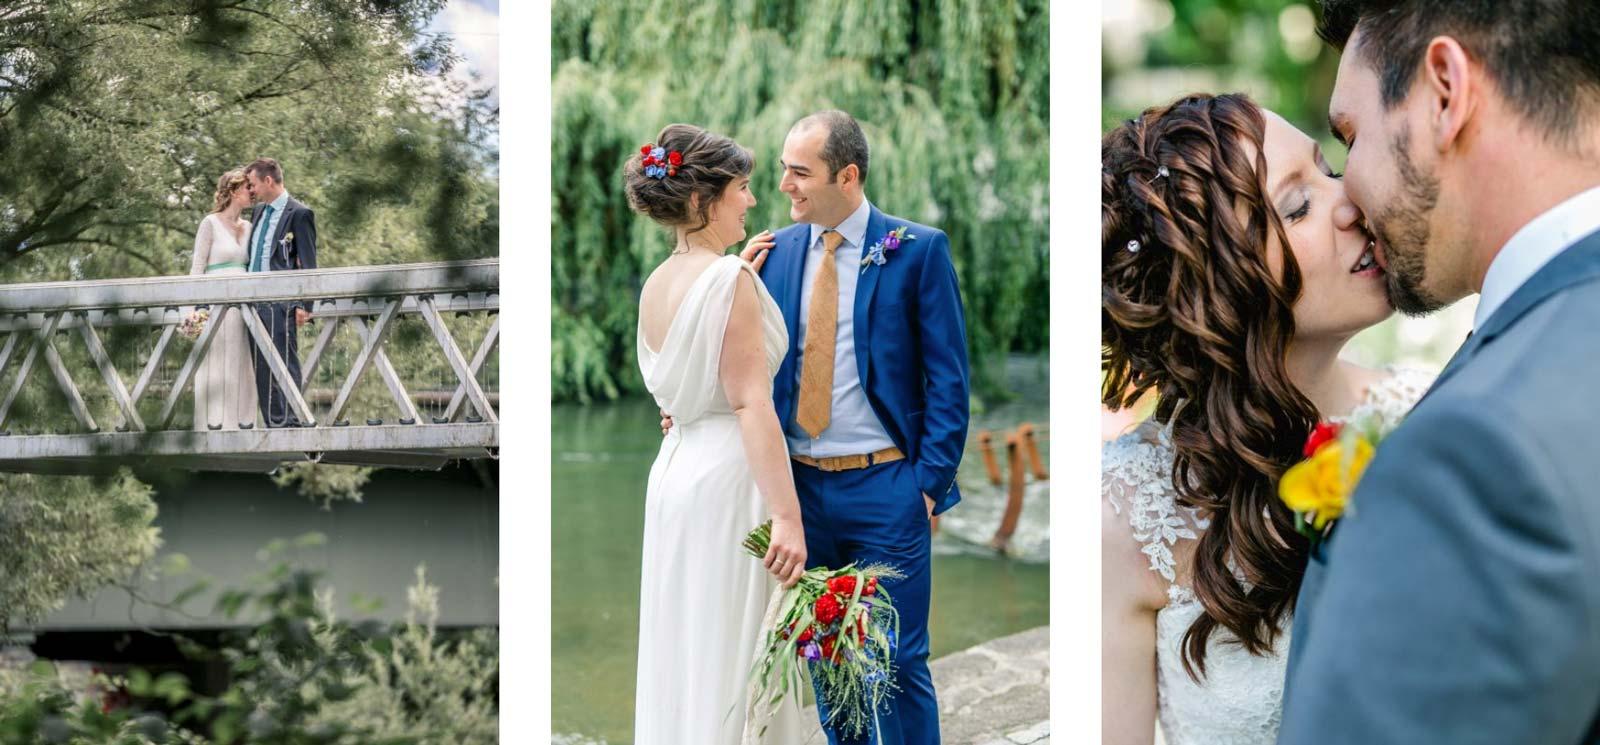 Paarshooting - Hochzeitsfotos